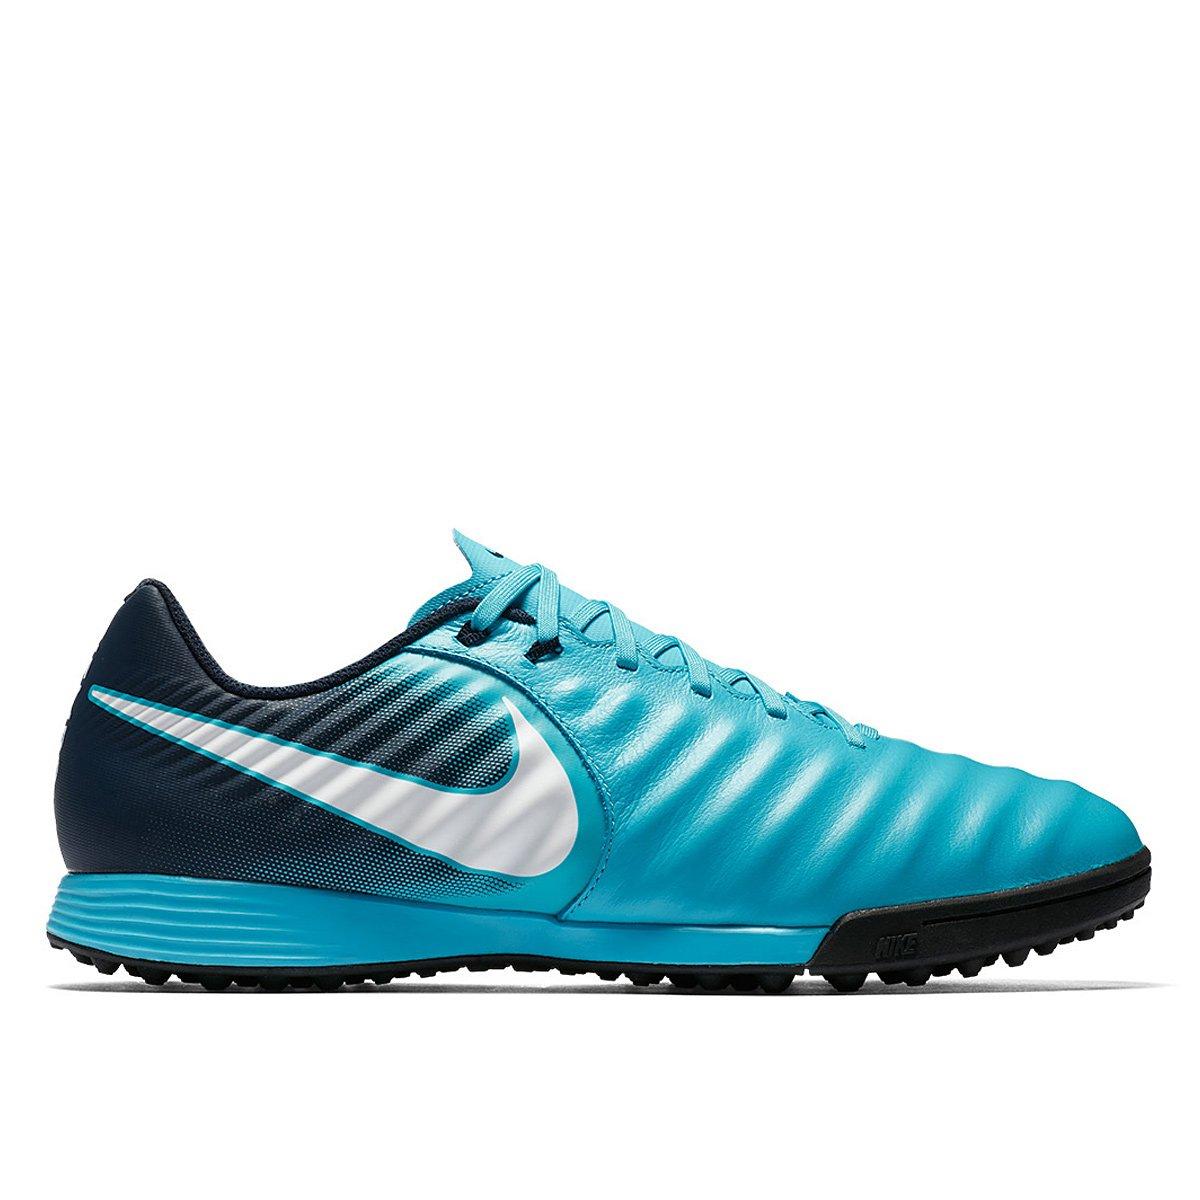 5b1b97f755ed9 Chuteira Society Nike Tiempo Ligera 4 TF - Azul e Branco | Allianz Parque  Shop